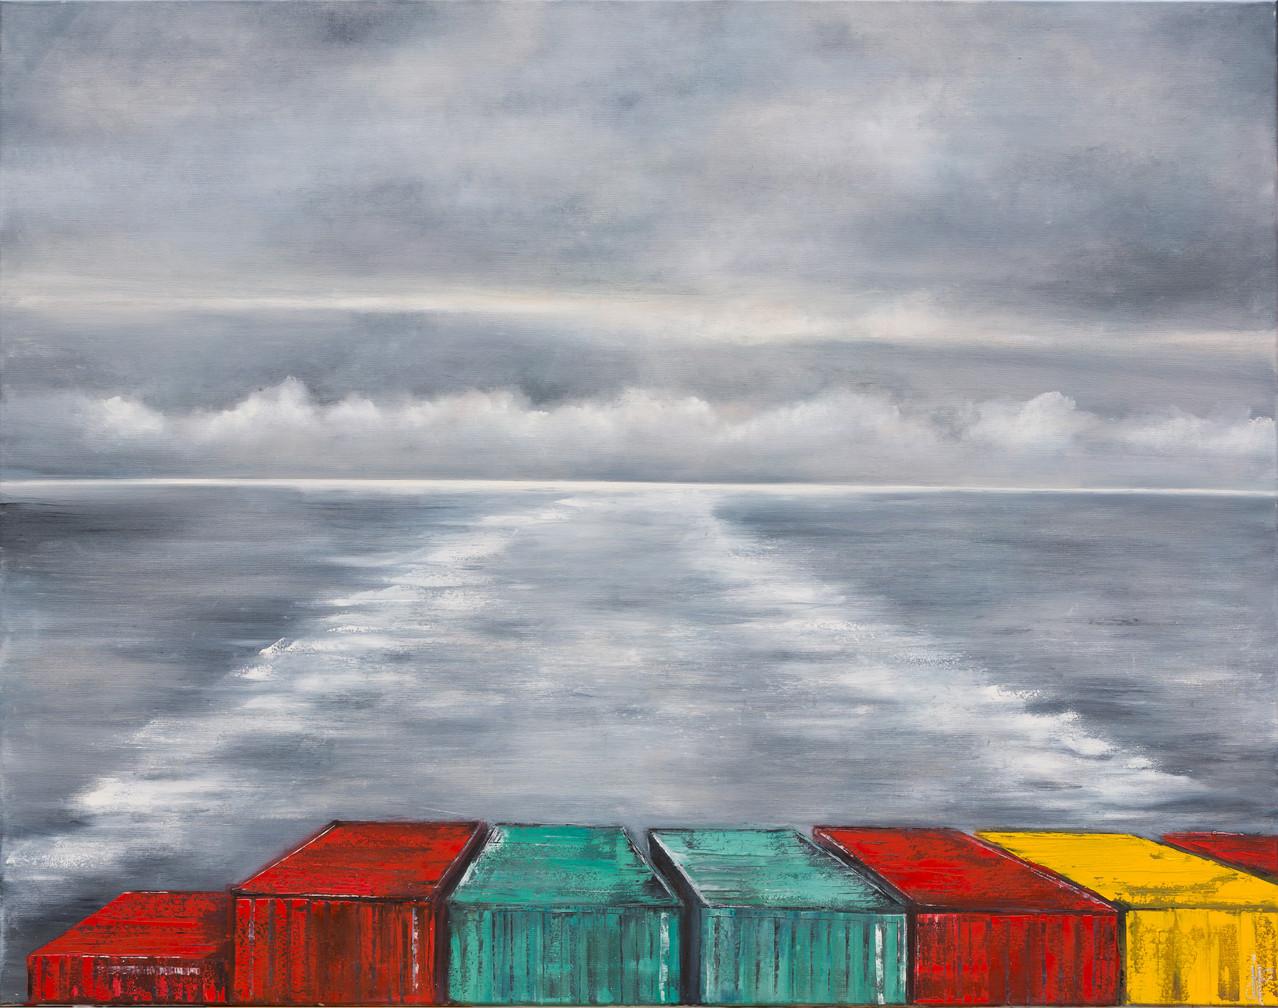 Rückblick, 140 cm cm x 110 cm, Öl auf Leinwand, 2013